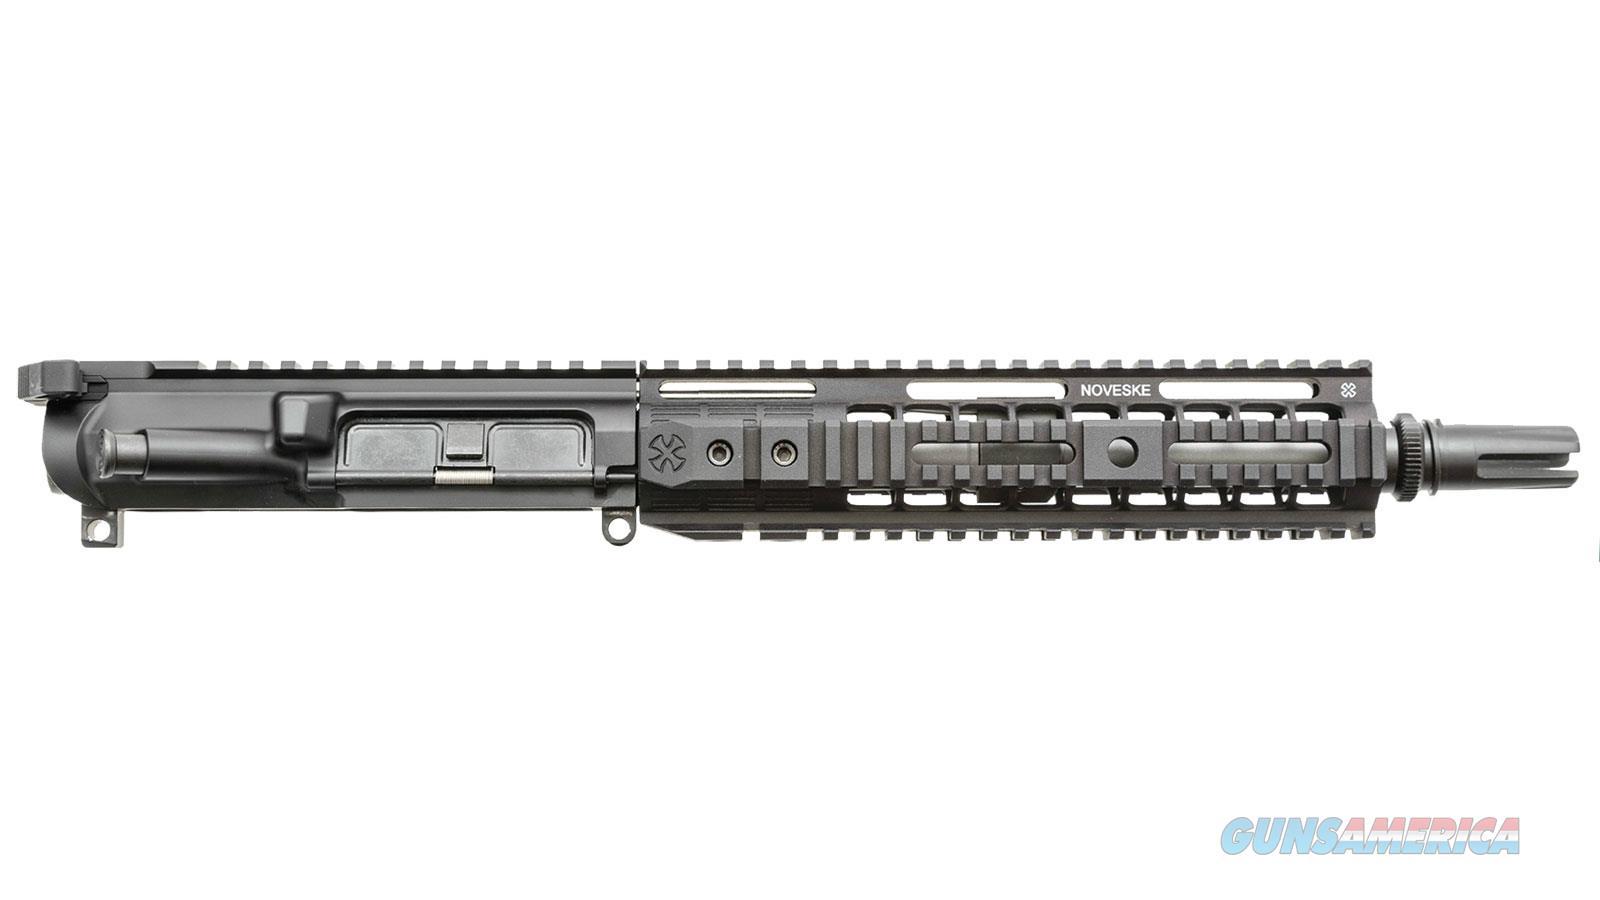 Noveske Rifleworks Llc 10.5 Cqb W/Nsr-9 5.56Mm 03000105  Non-Guns > Gun Parts > M16-AR15 > Upper Only